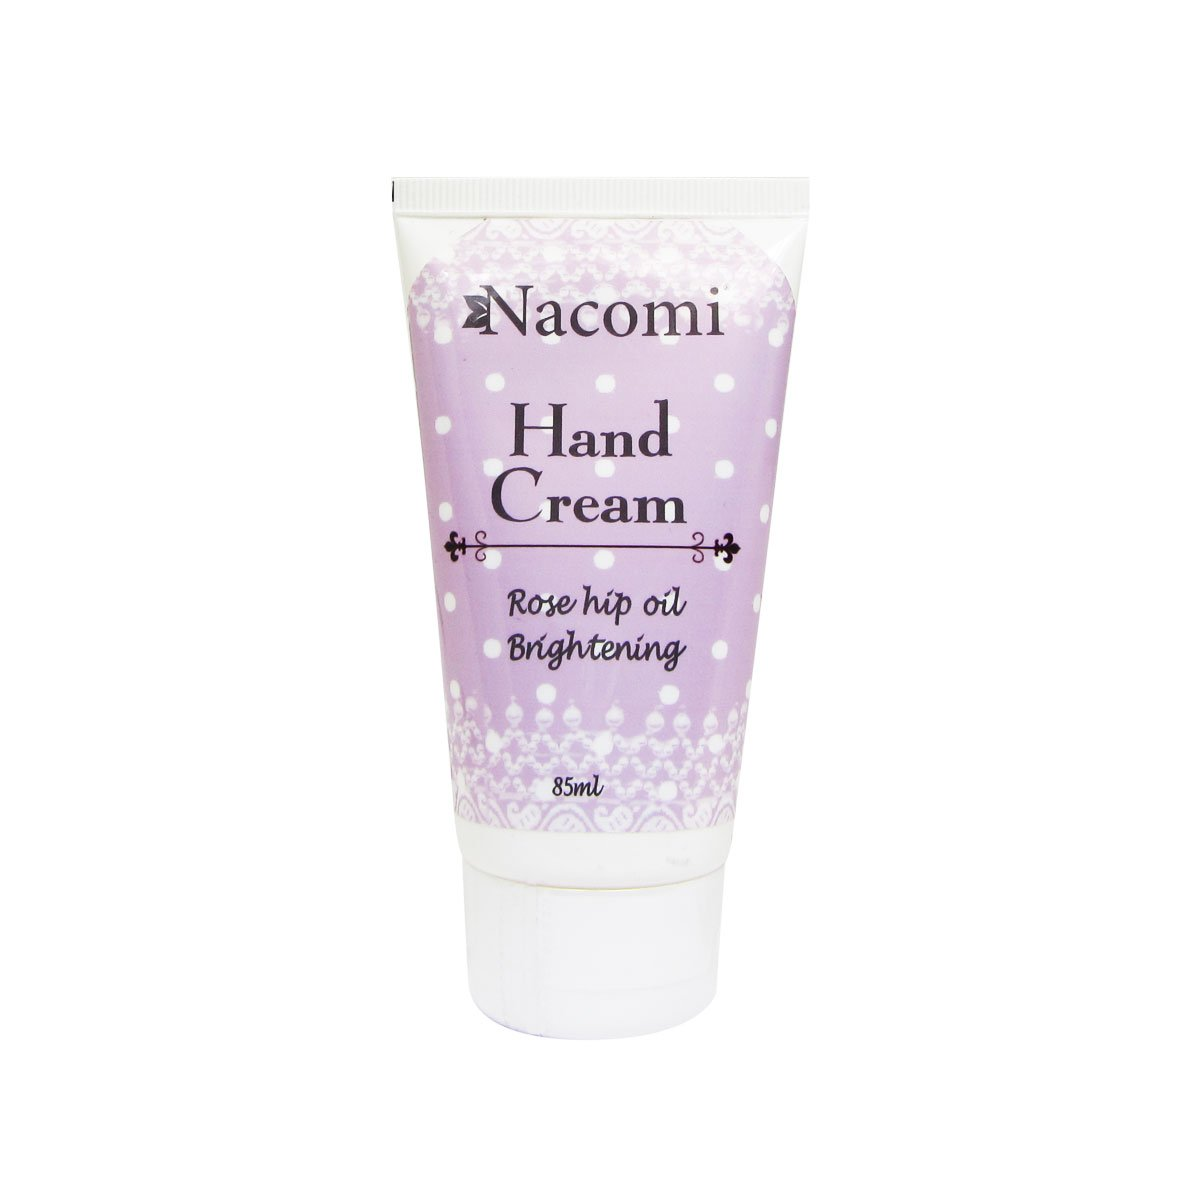 Nacomi Hand Cream Rose Hip Oil 85ml